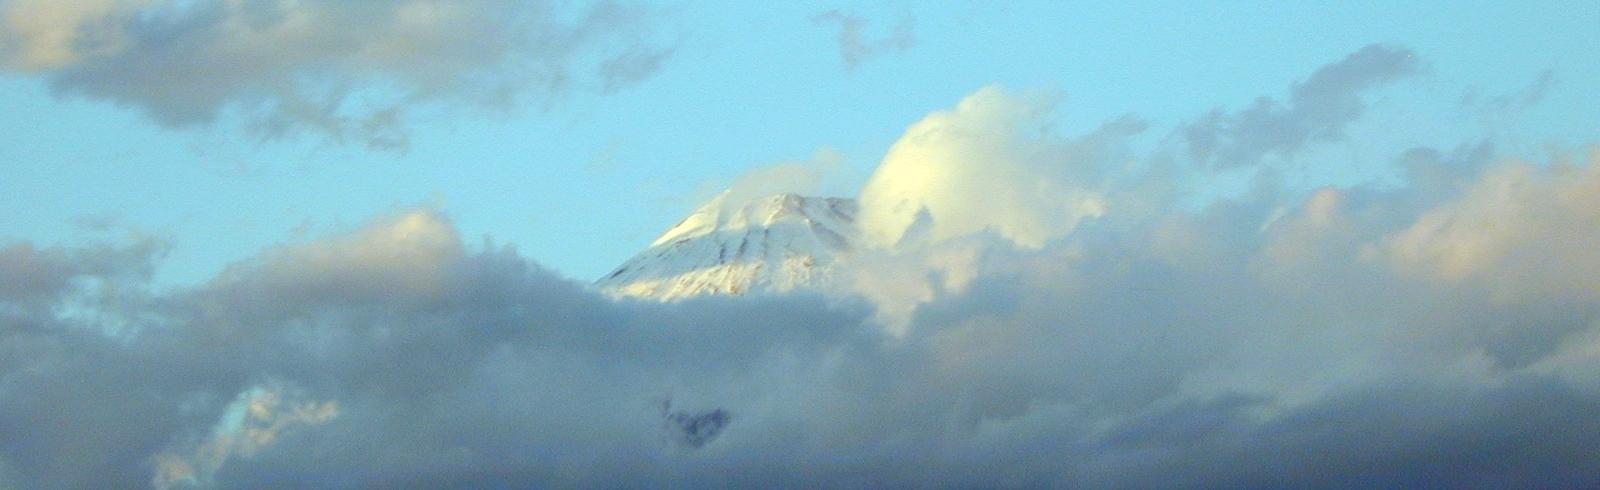 Soleil levant sur Fuji